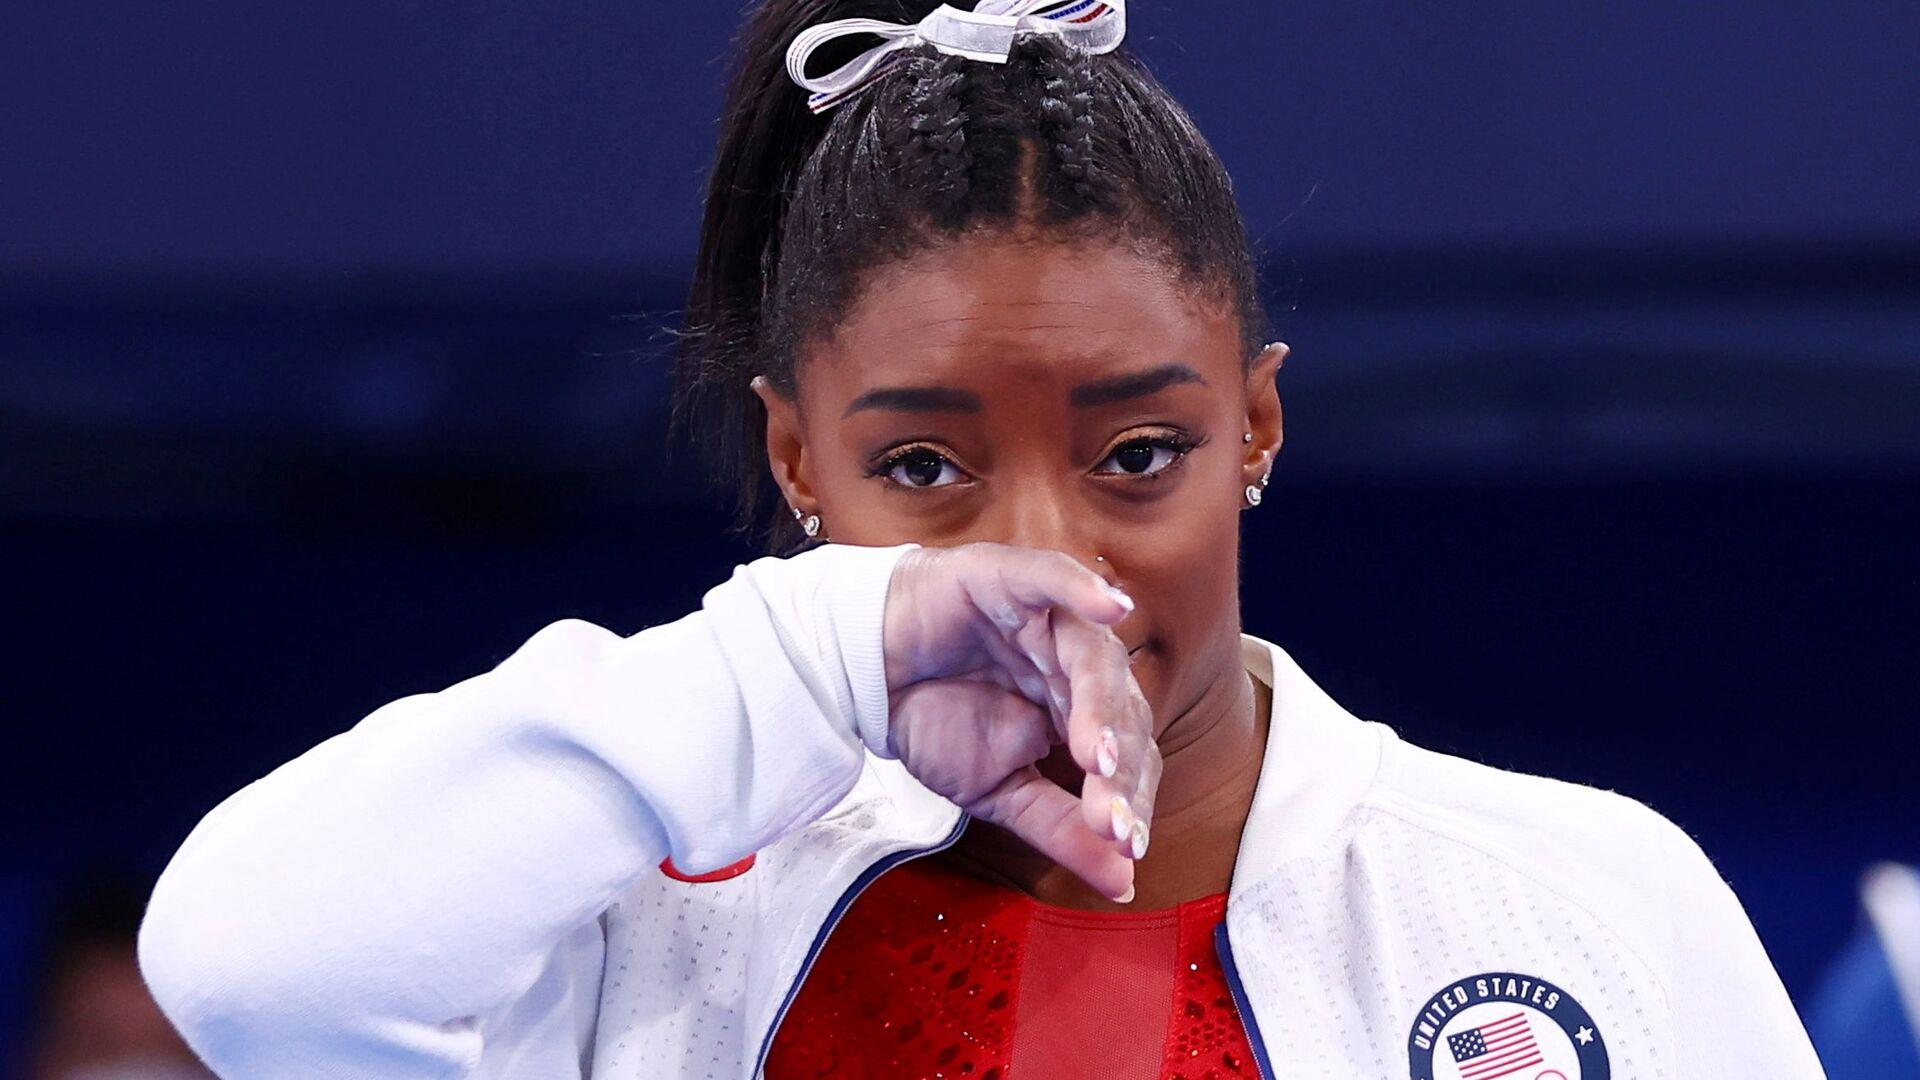 Tokyo 2020 Olympics - Gymnastics - Artistic - Women's Team - Final - Ariake Gymnastics Centre, Tokyo, Japan - July 27, 2021. Simone Biles of the United States during the Women's Team Final  - Sputnik International, 1920, 31.07.2021